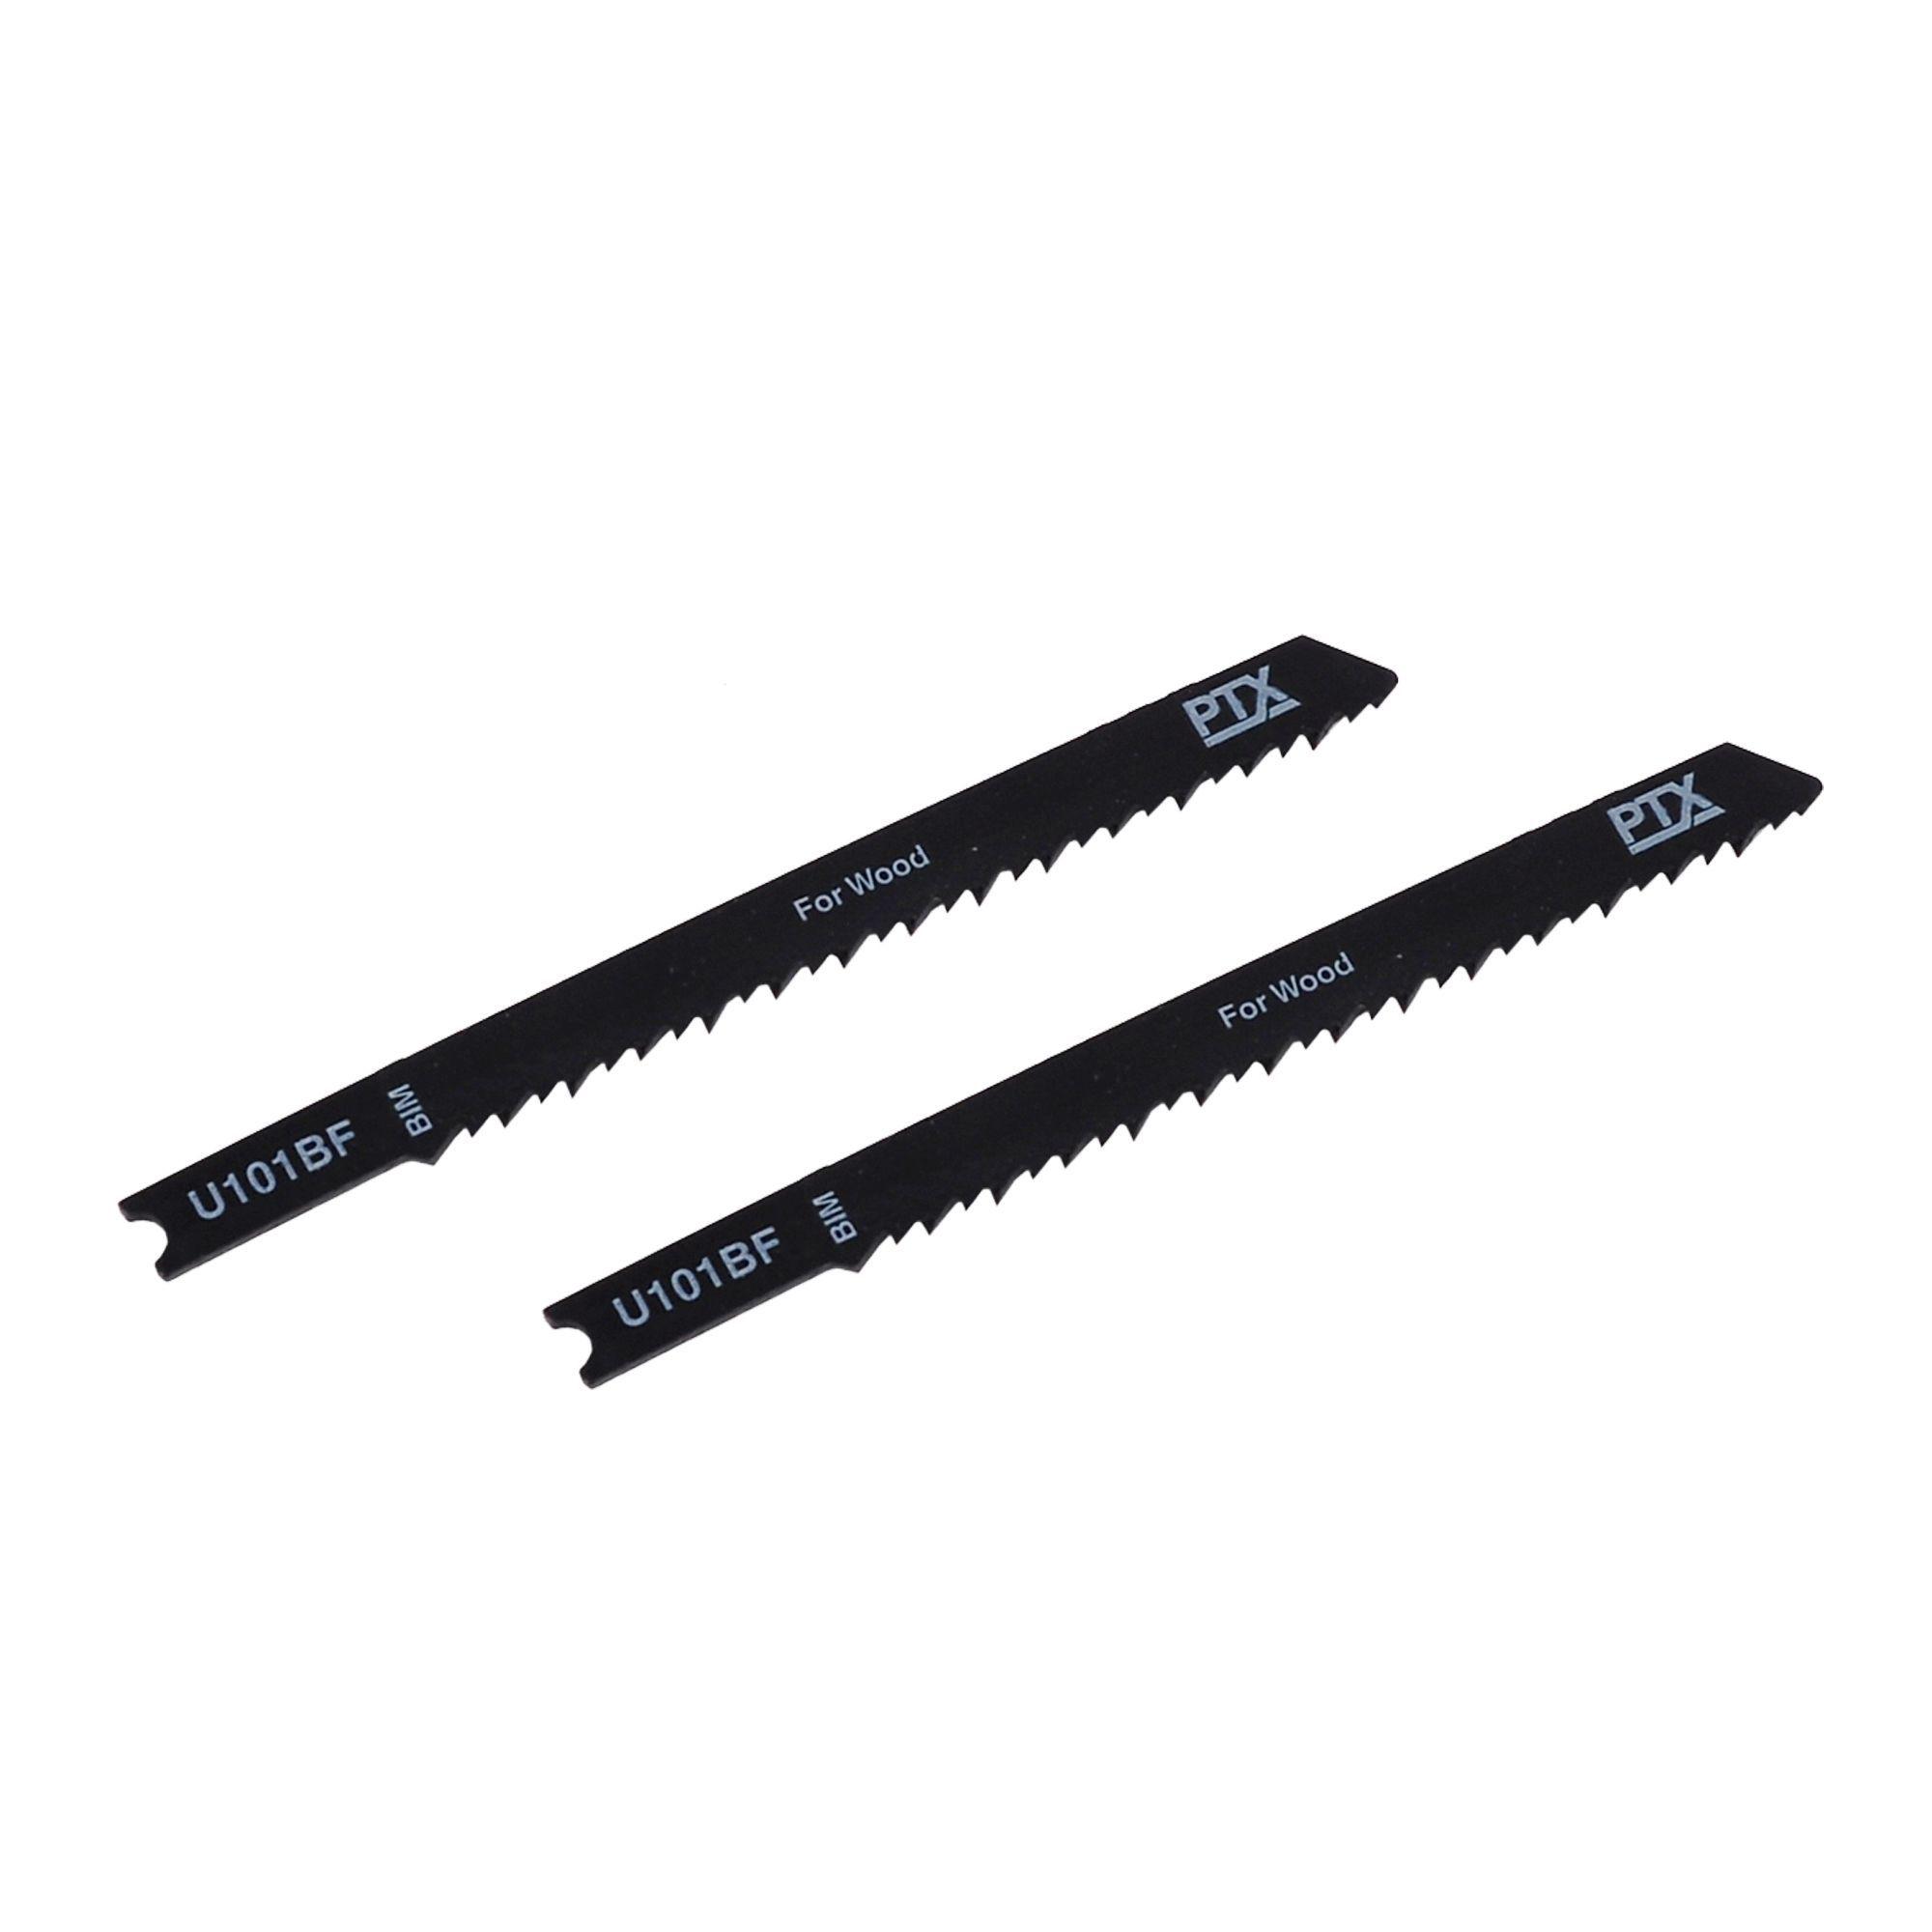 Ptx U-shank Wood Jigsaw Blade U101bf 100mm, Pack Of 2